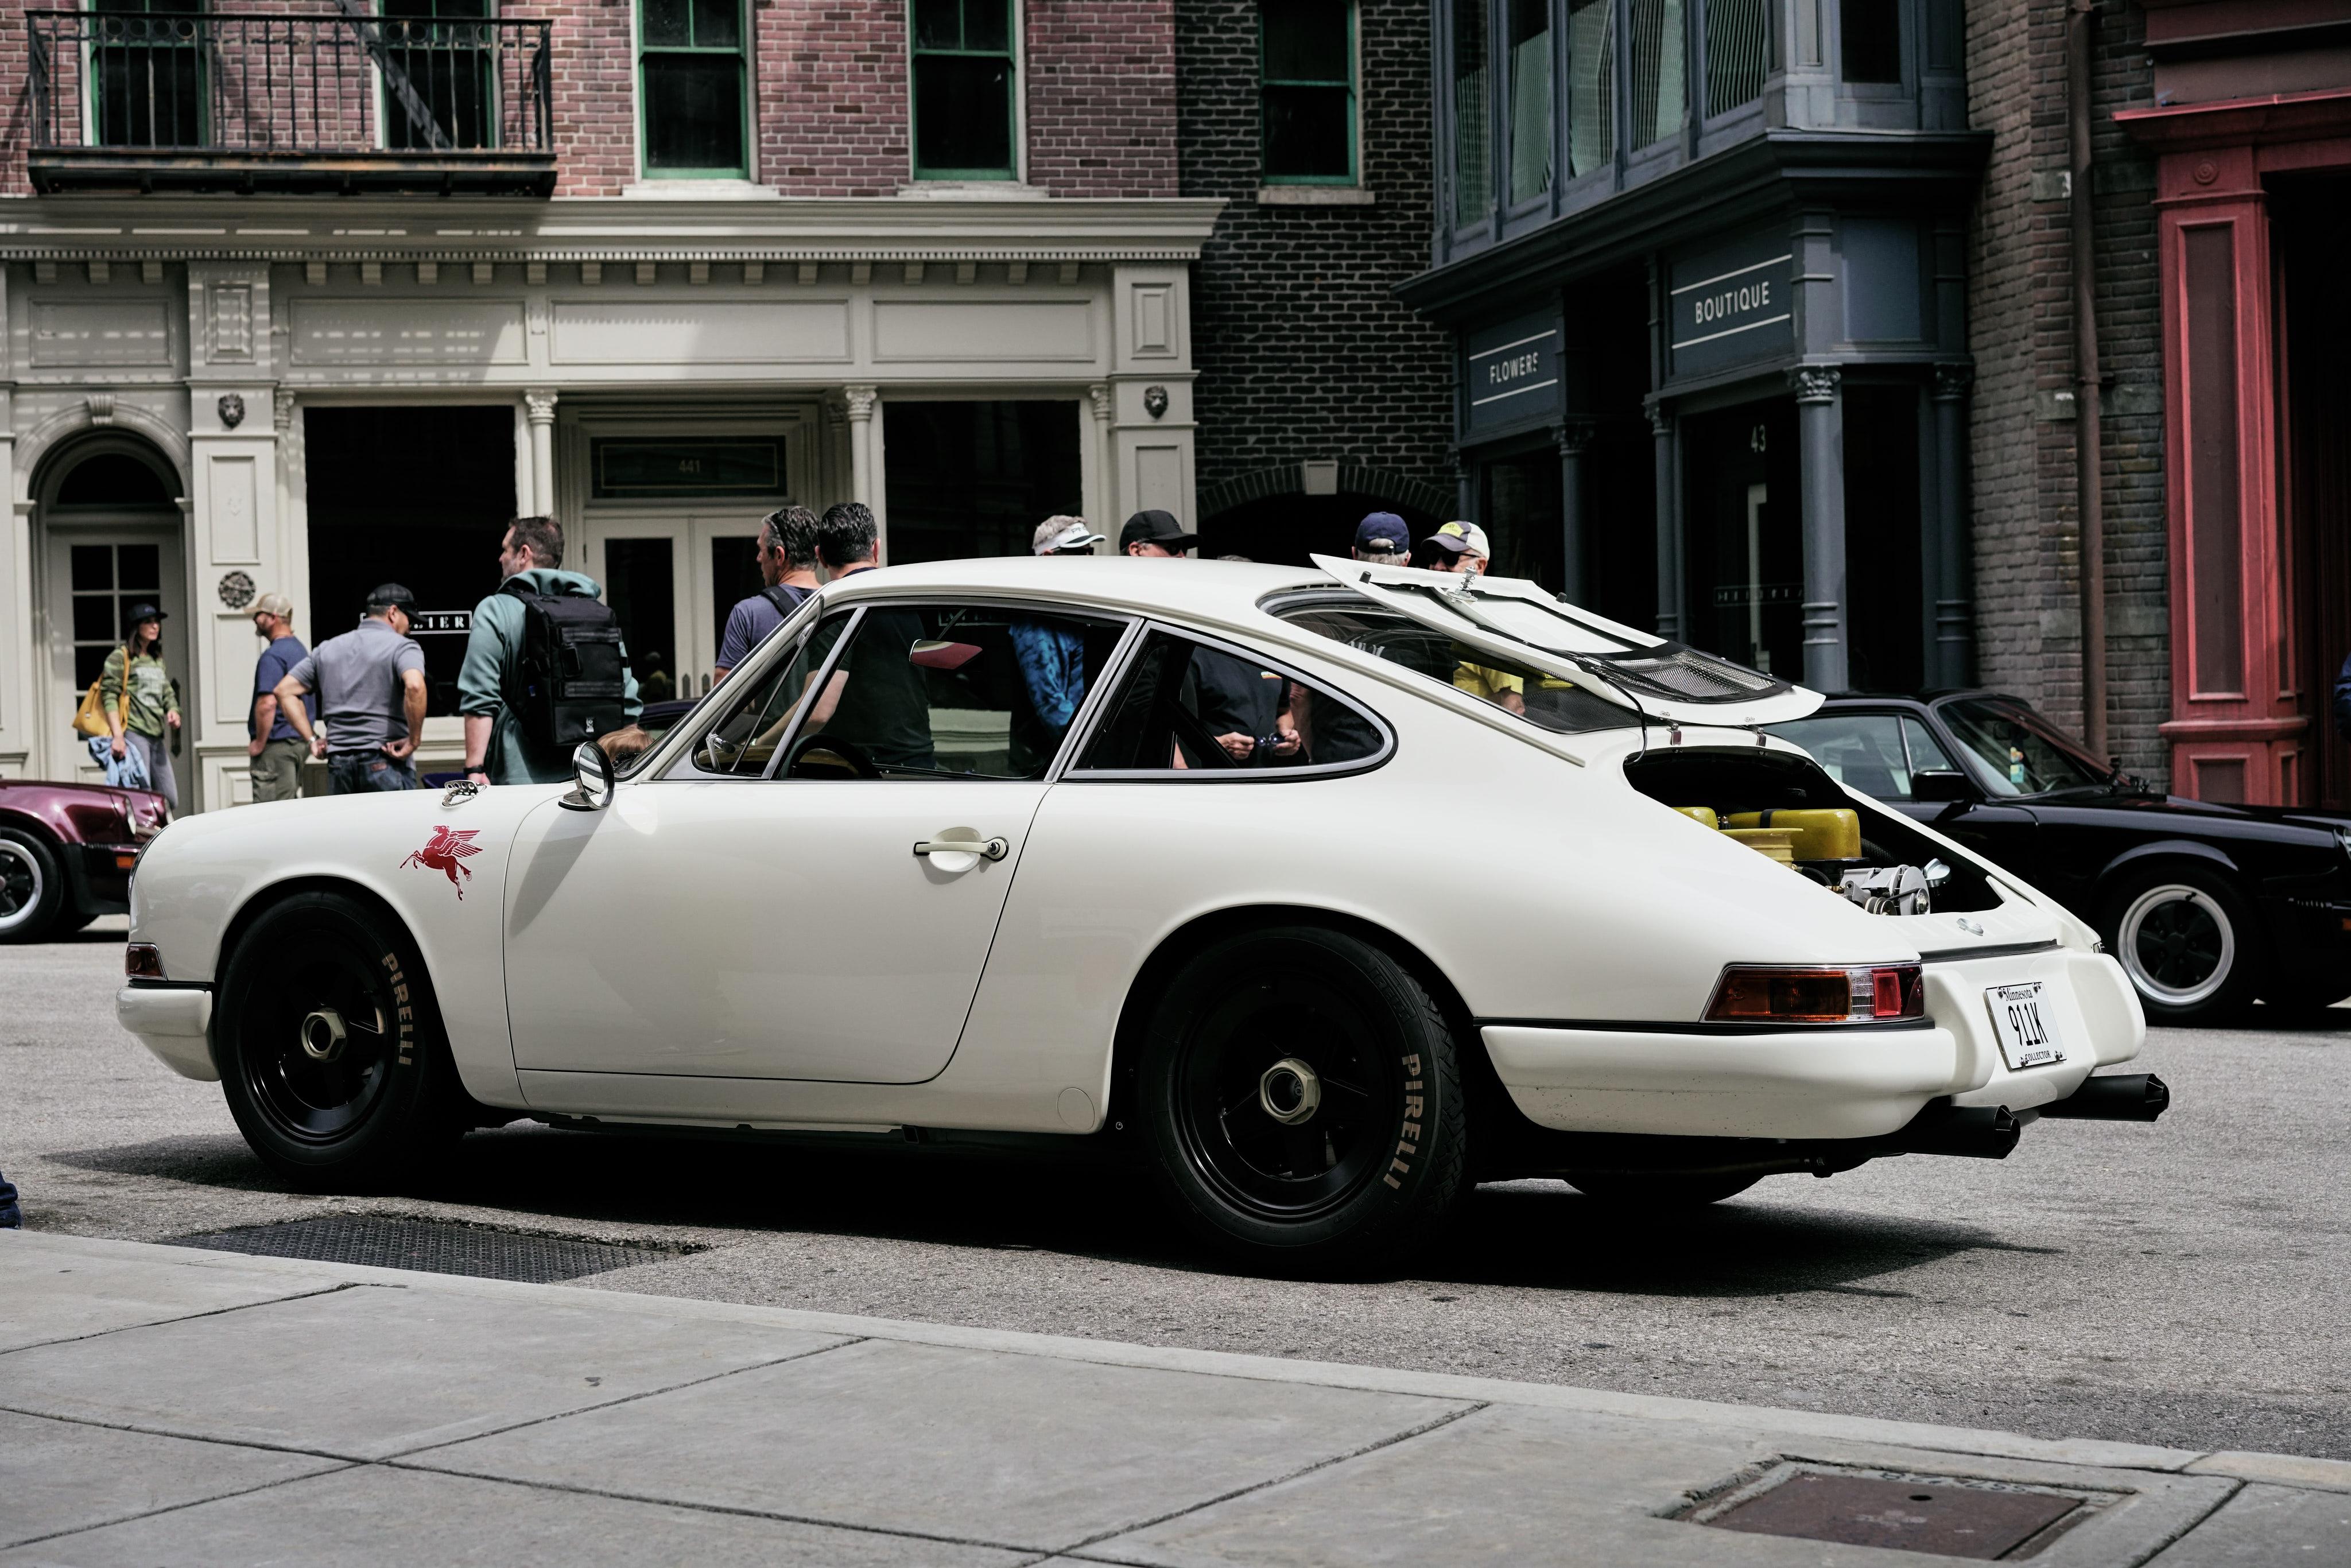 Luftgekühlt-6-Rennen-36-Porsche-911K-1968-Rod-Emory-Outlaw